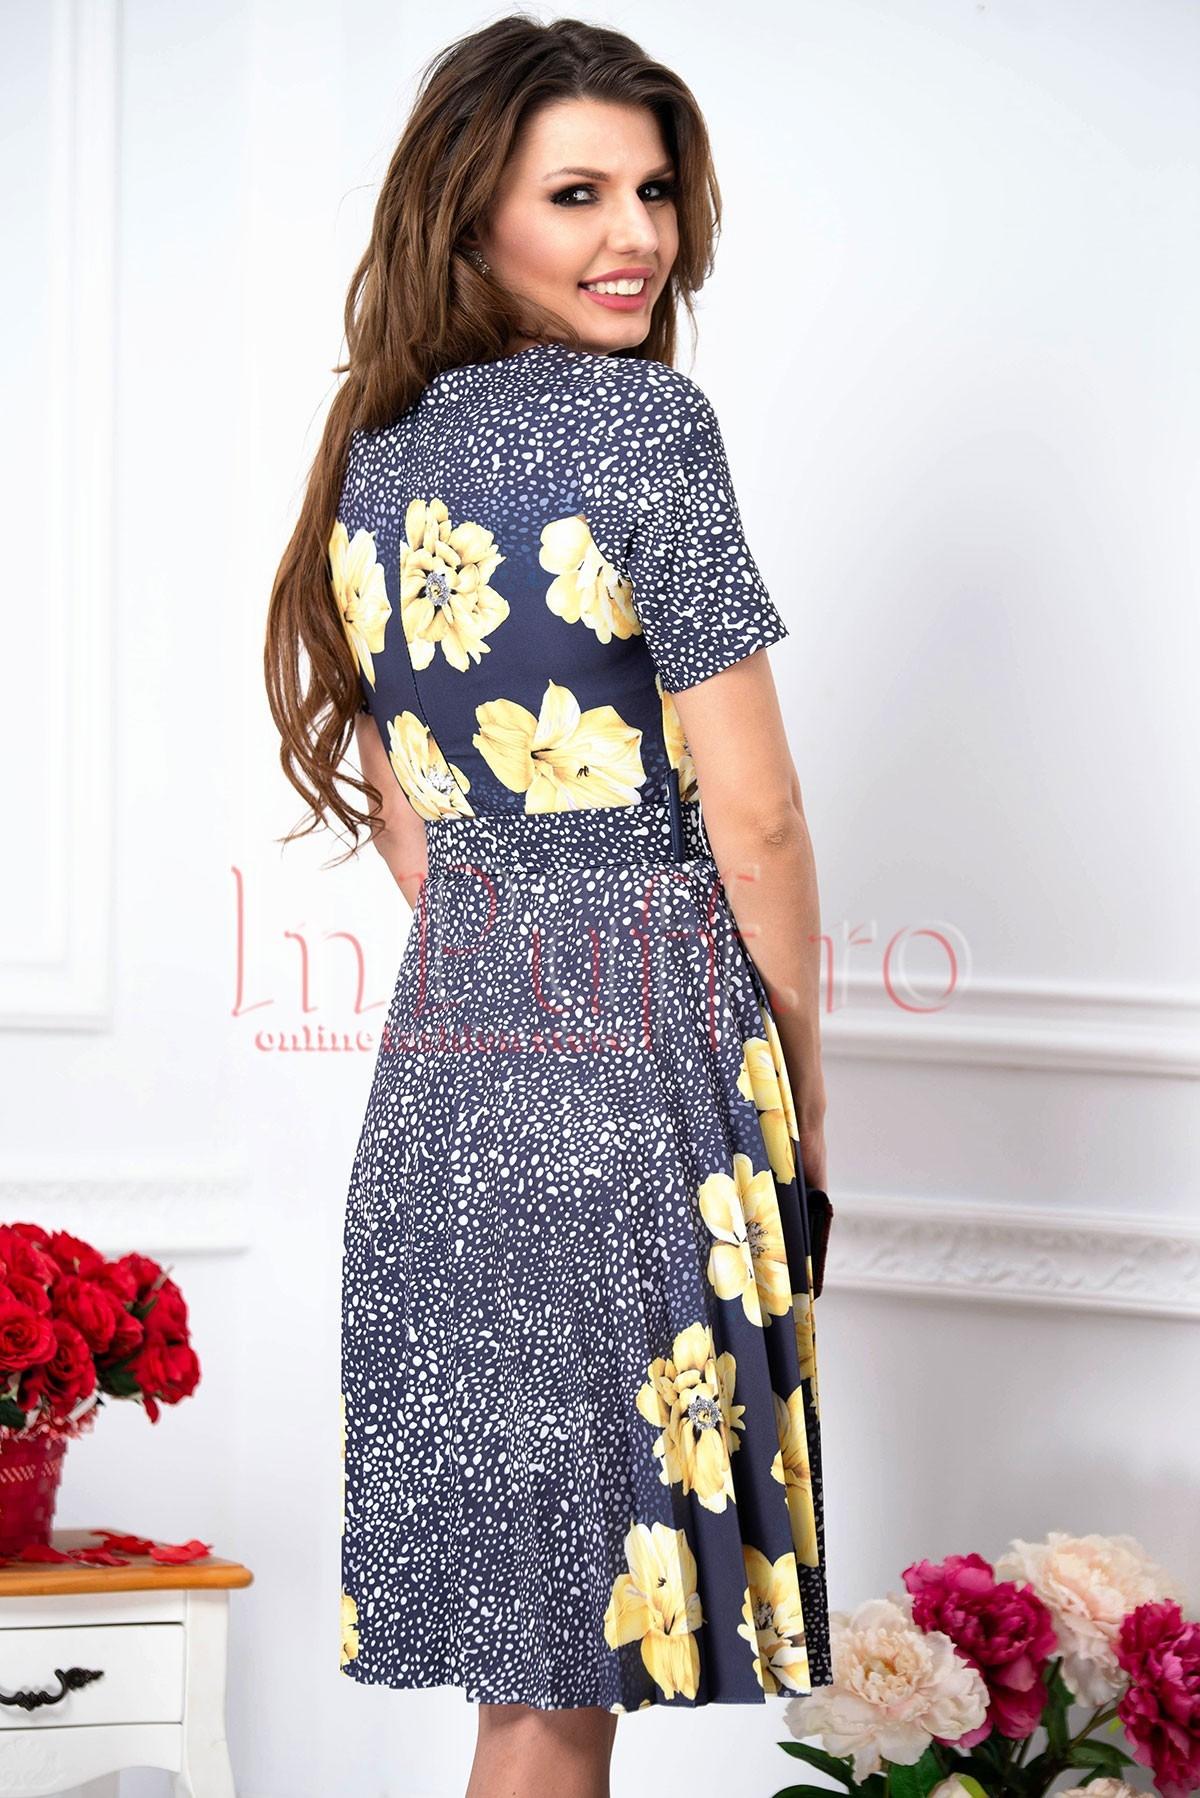 Rochie Fofy bleumarin pliuri cu imprimeu floral galben si buline